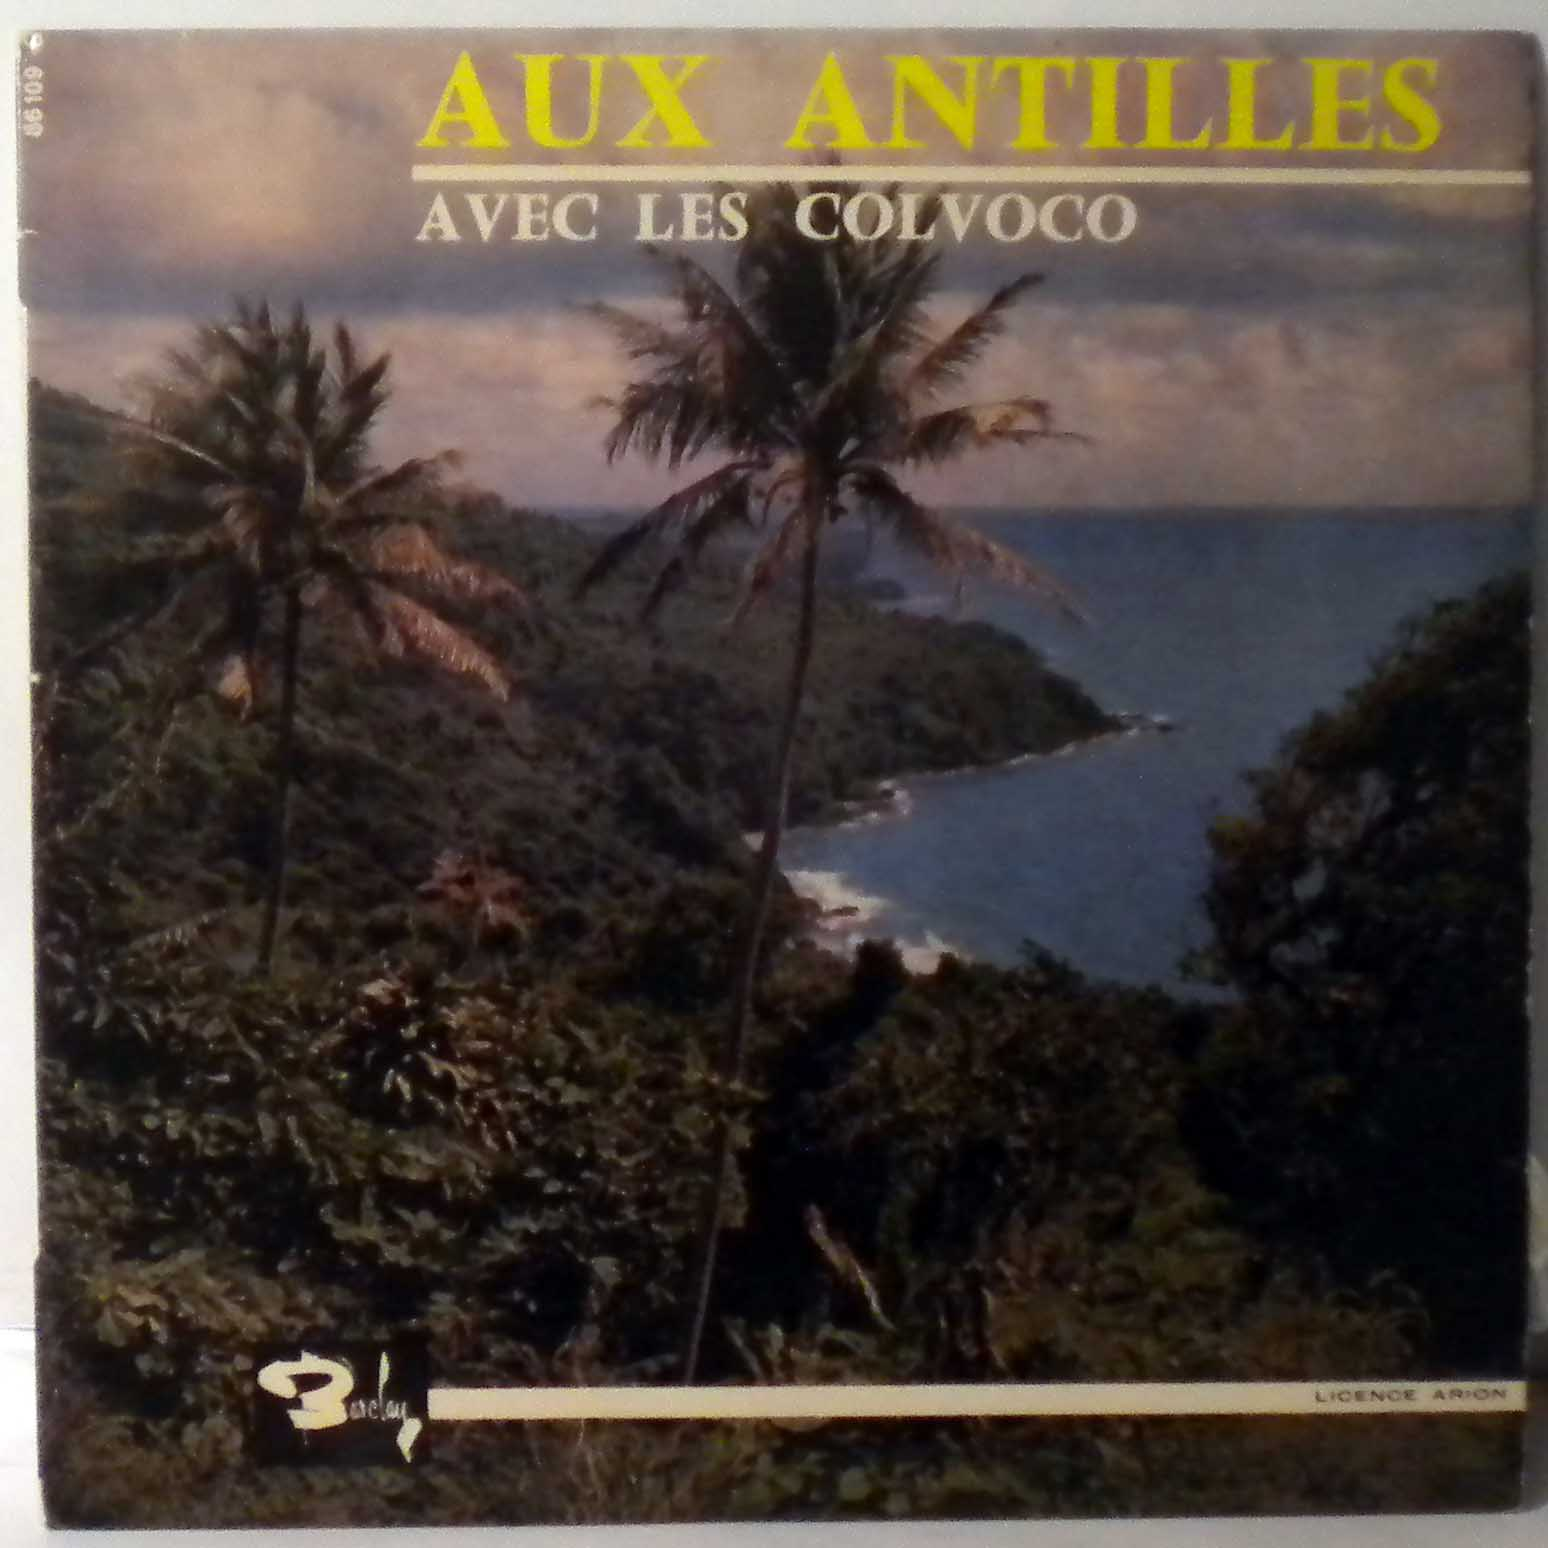 LES COLVOCO - Aux Antilles Avec Les Colvoco - 10 inch